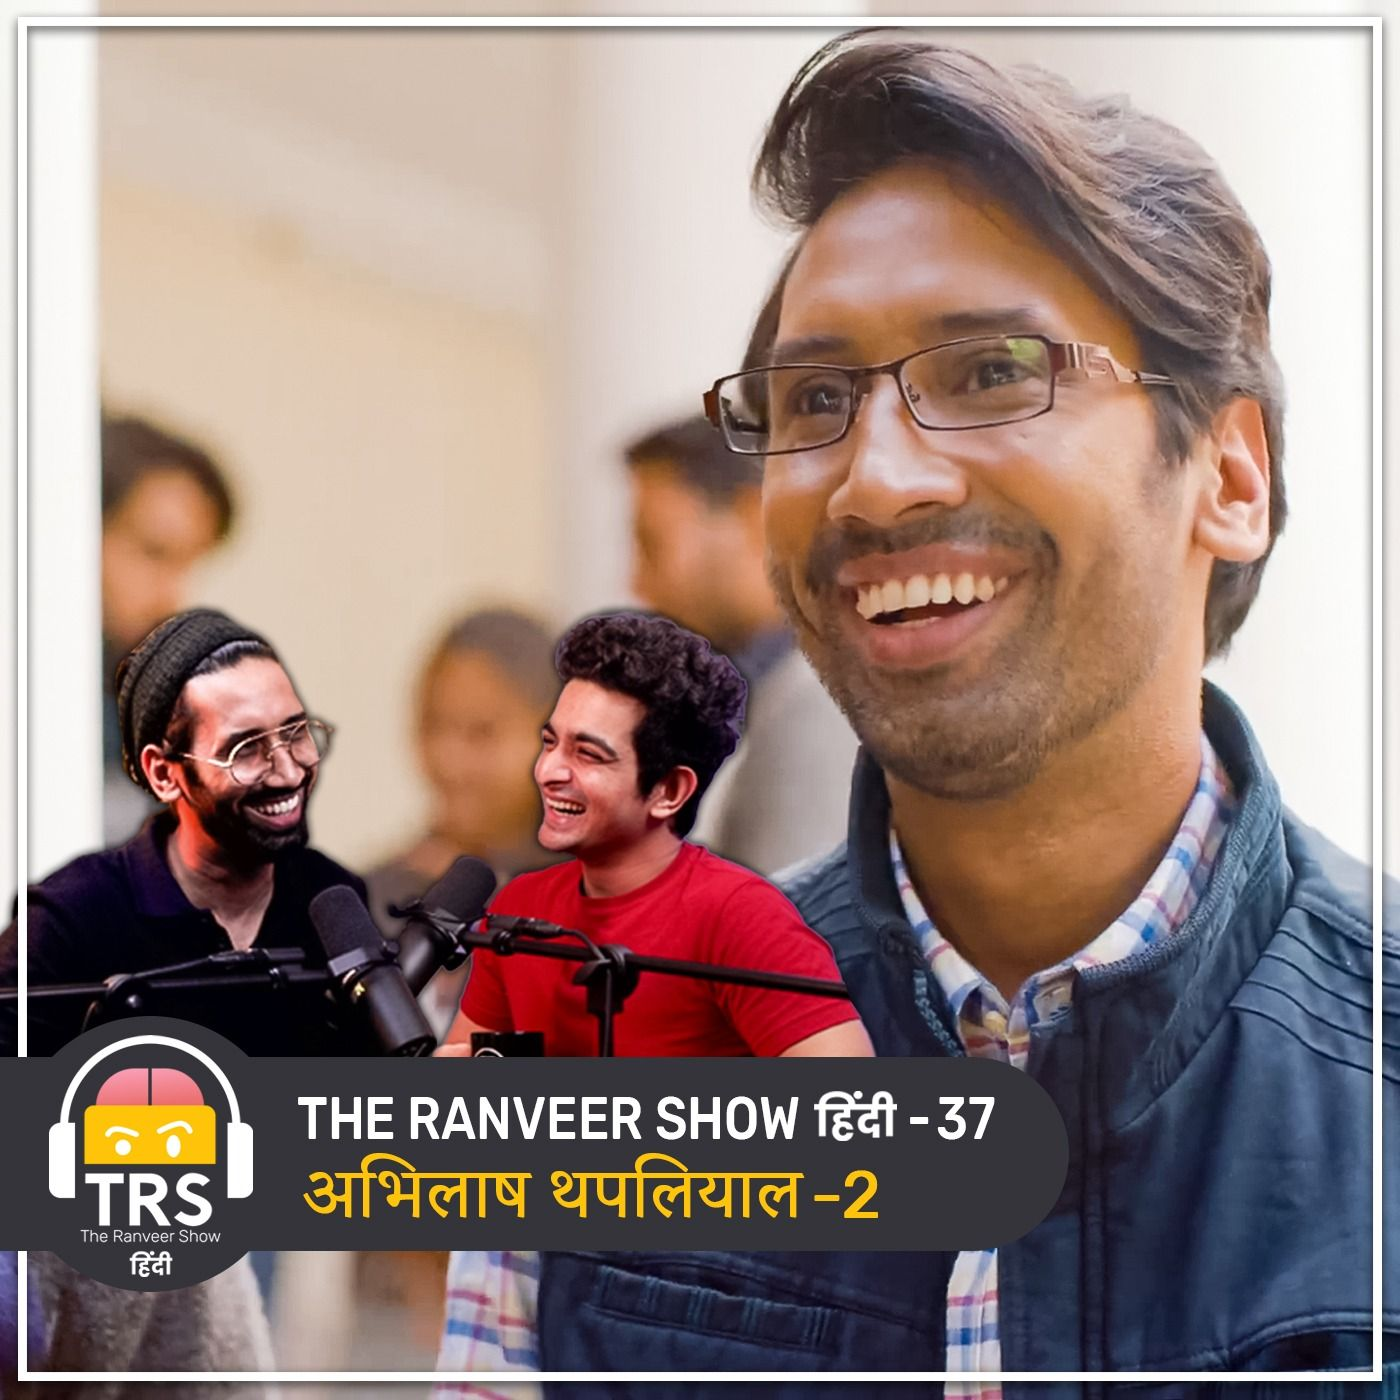 SK Sir Like Never Before - TVF Aspirants Fame Abhilash Thapliyal | The Ranveer Show हिंदी 37